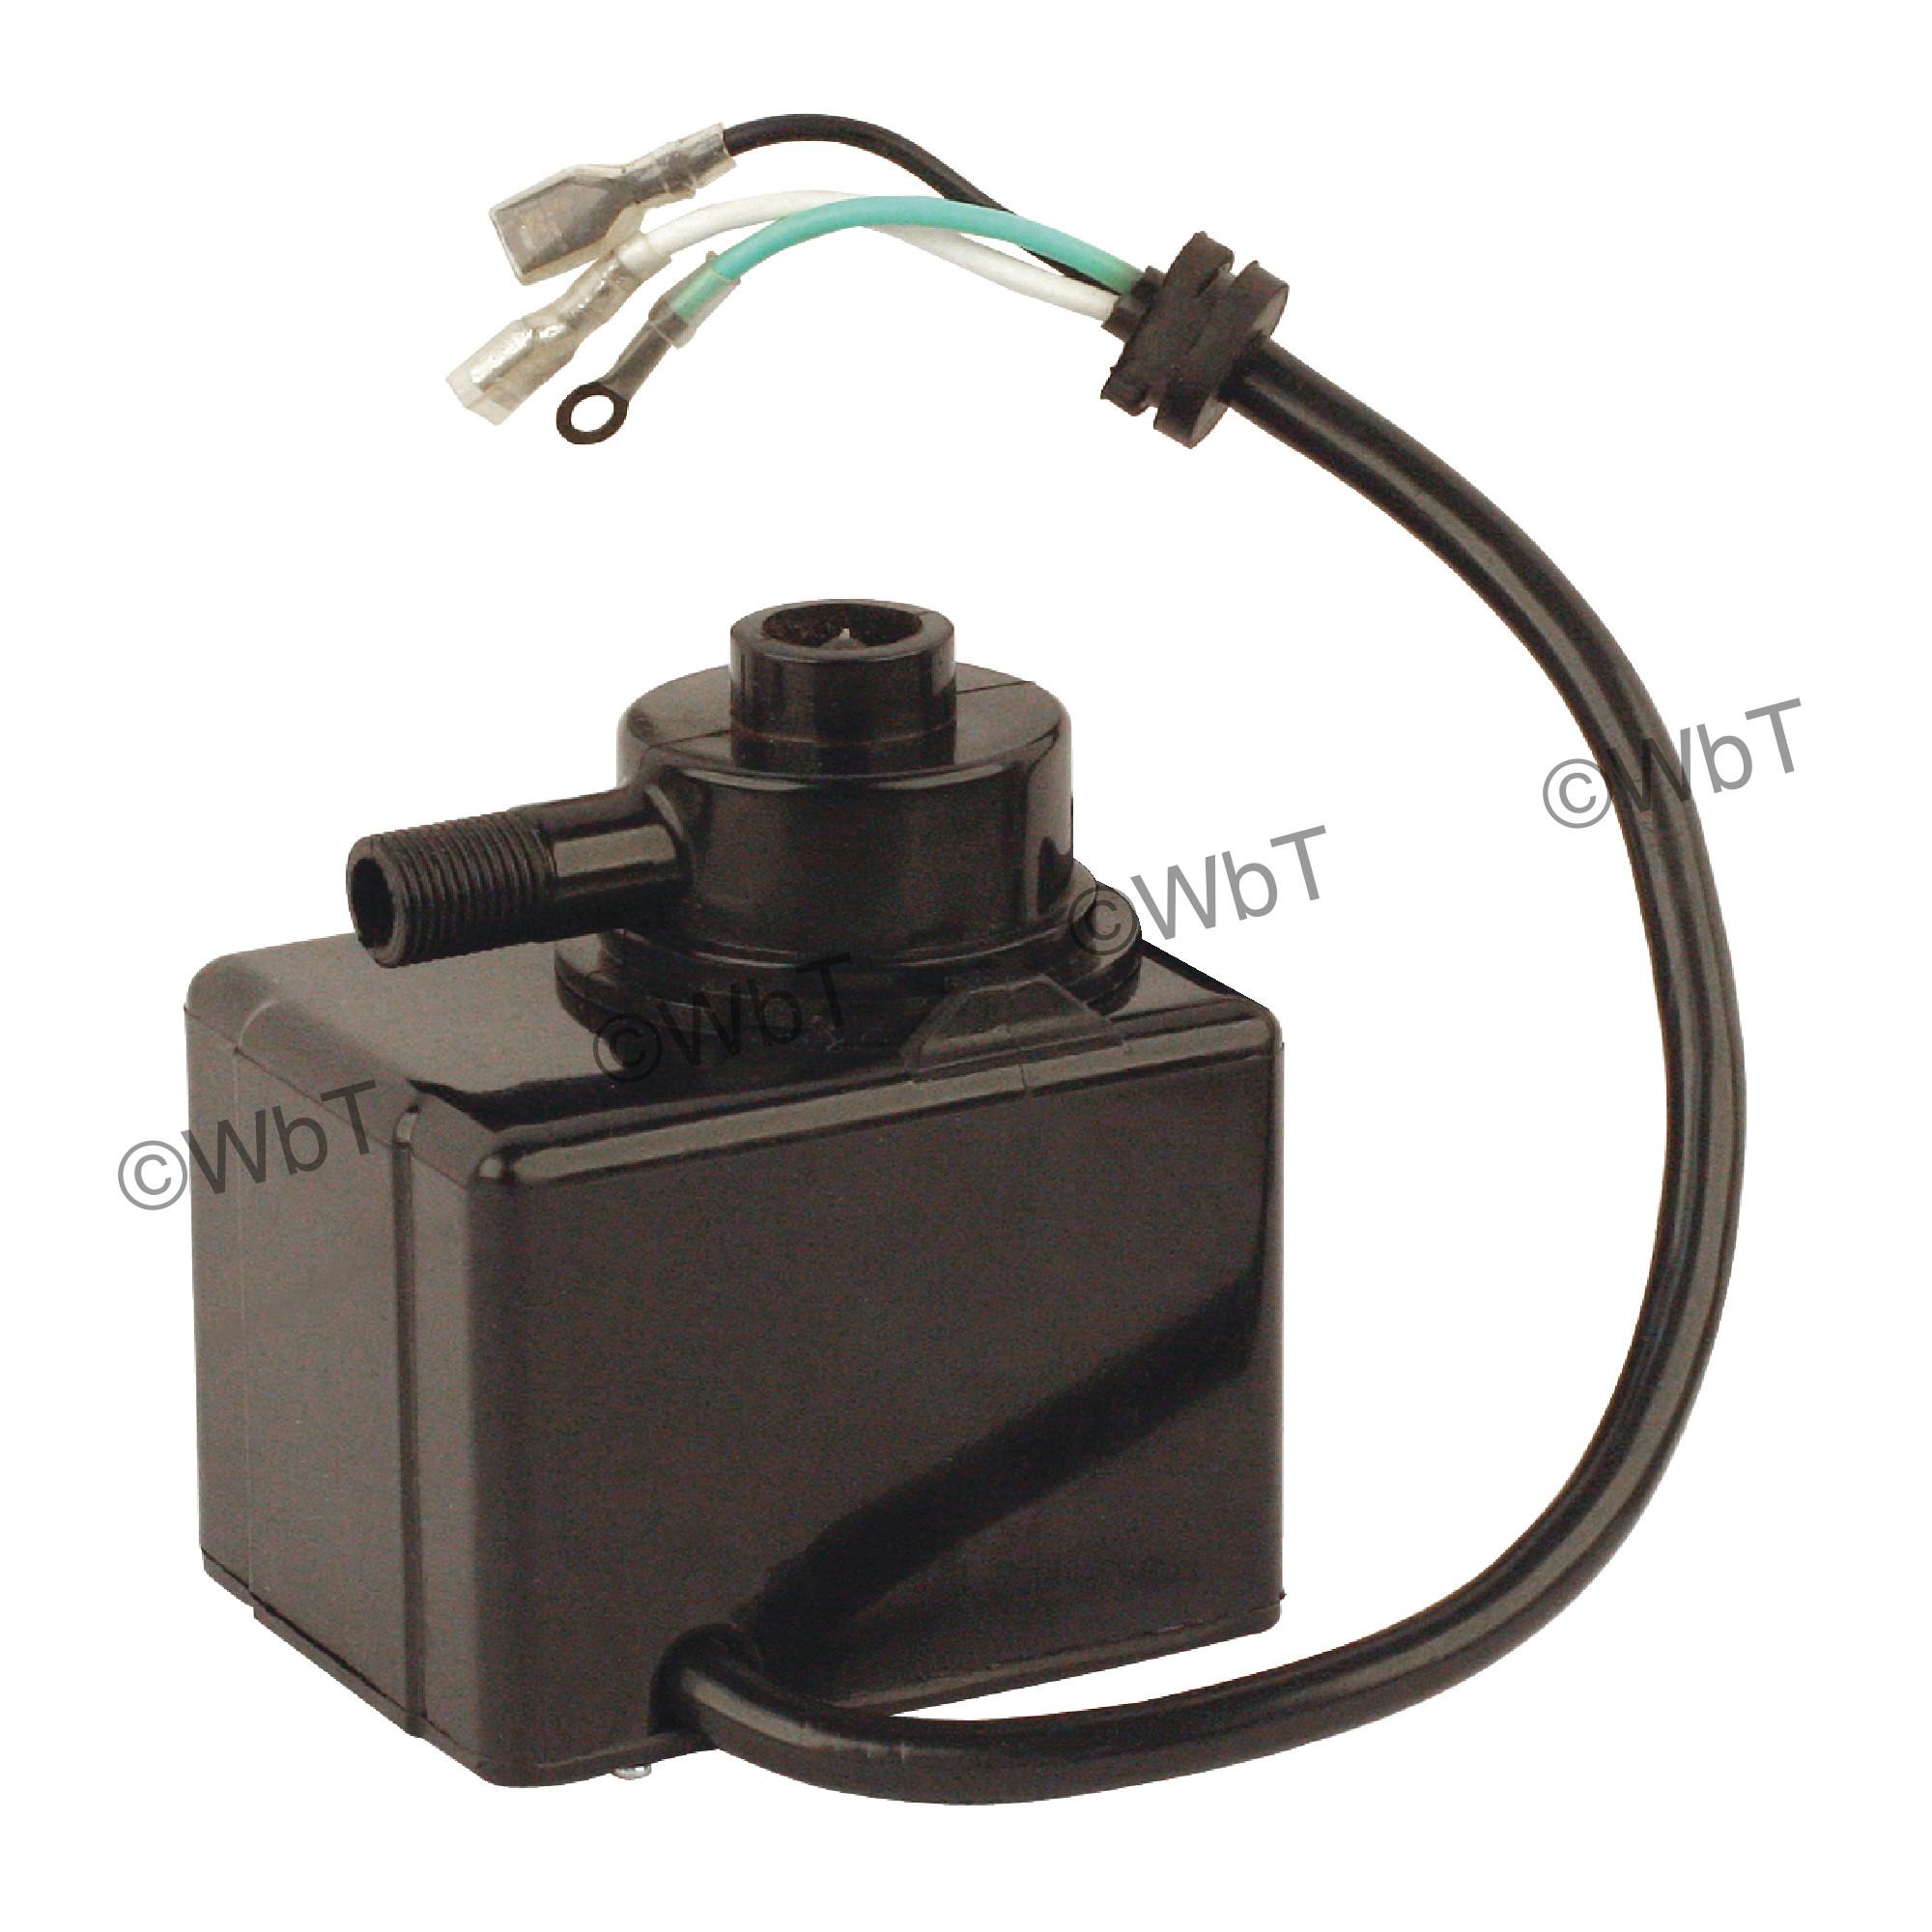 Recirculating Parts Washer Pump